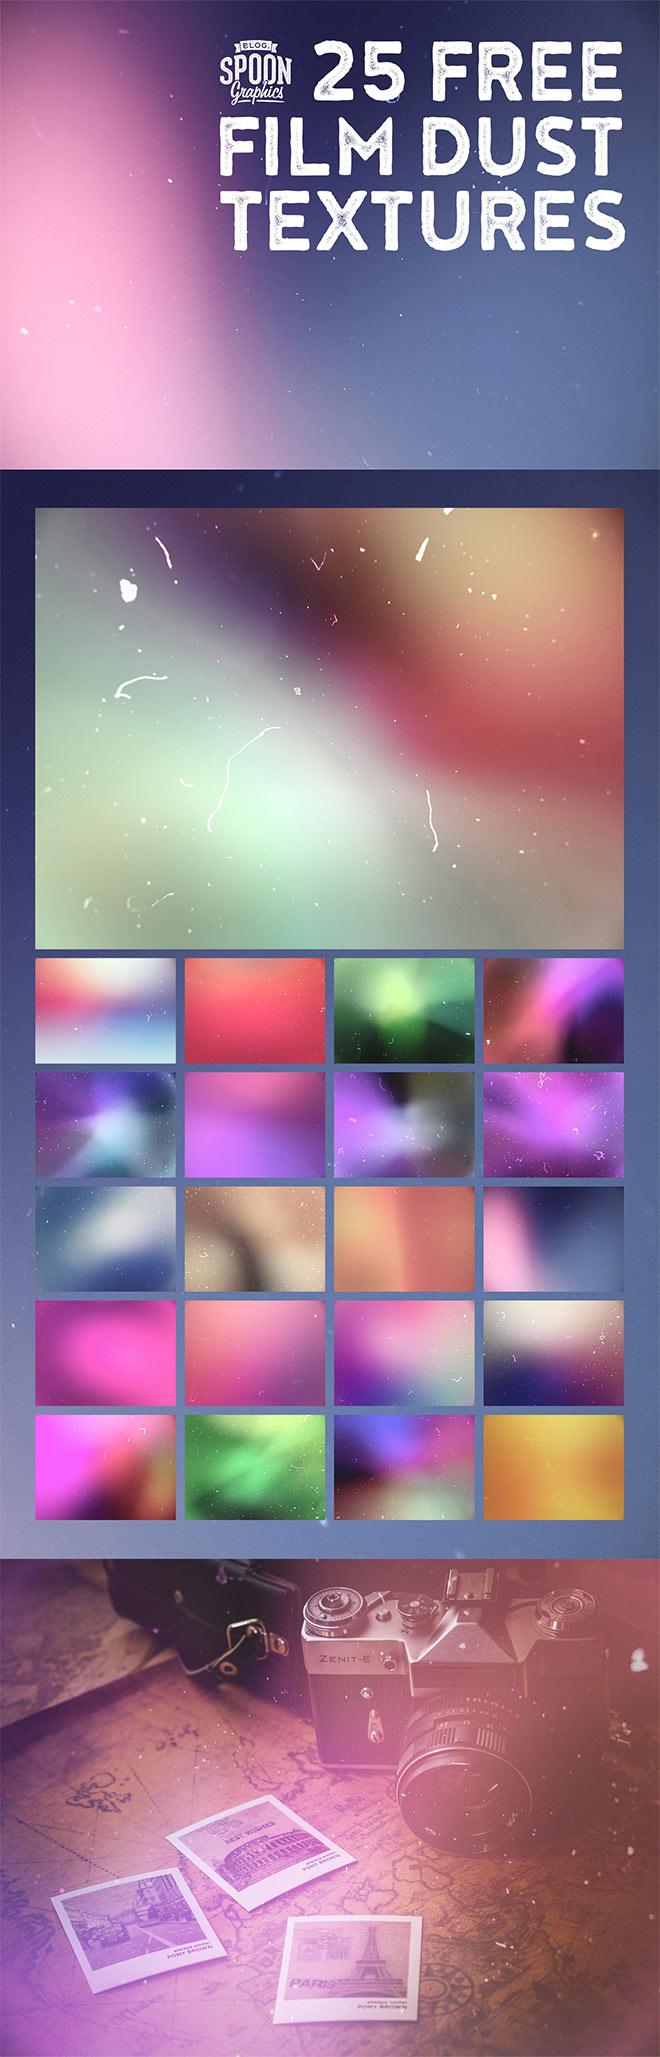 25 Free Film Dust Textures